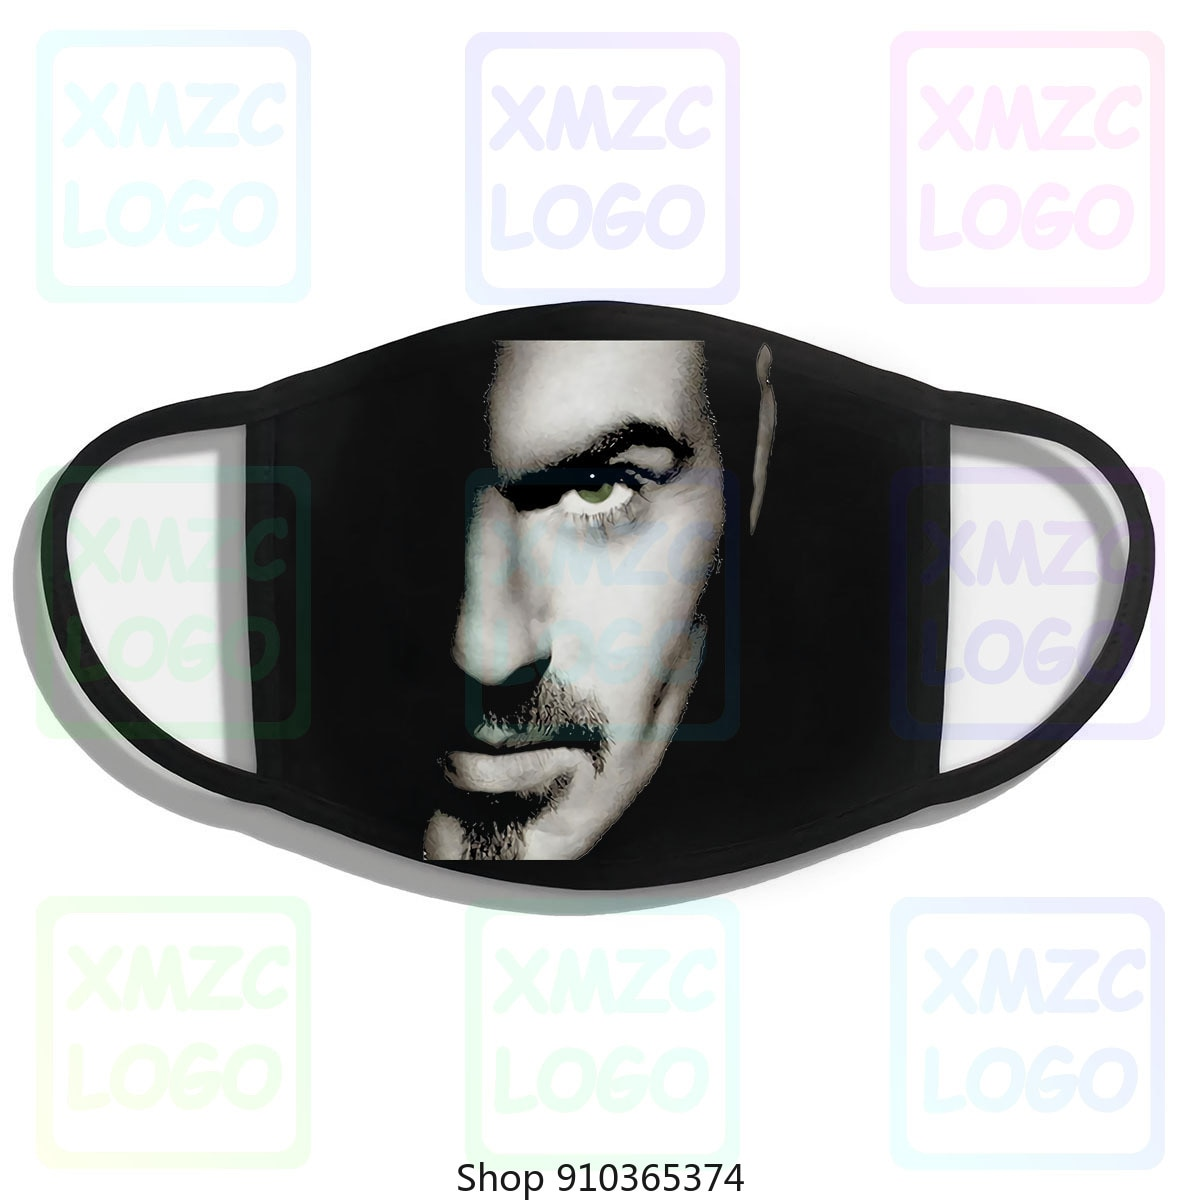 Máscara gráfica t música dos homens george michael tribute máscara m66 masculino tripulação pescoço topo t máscara